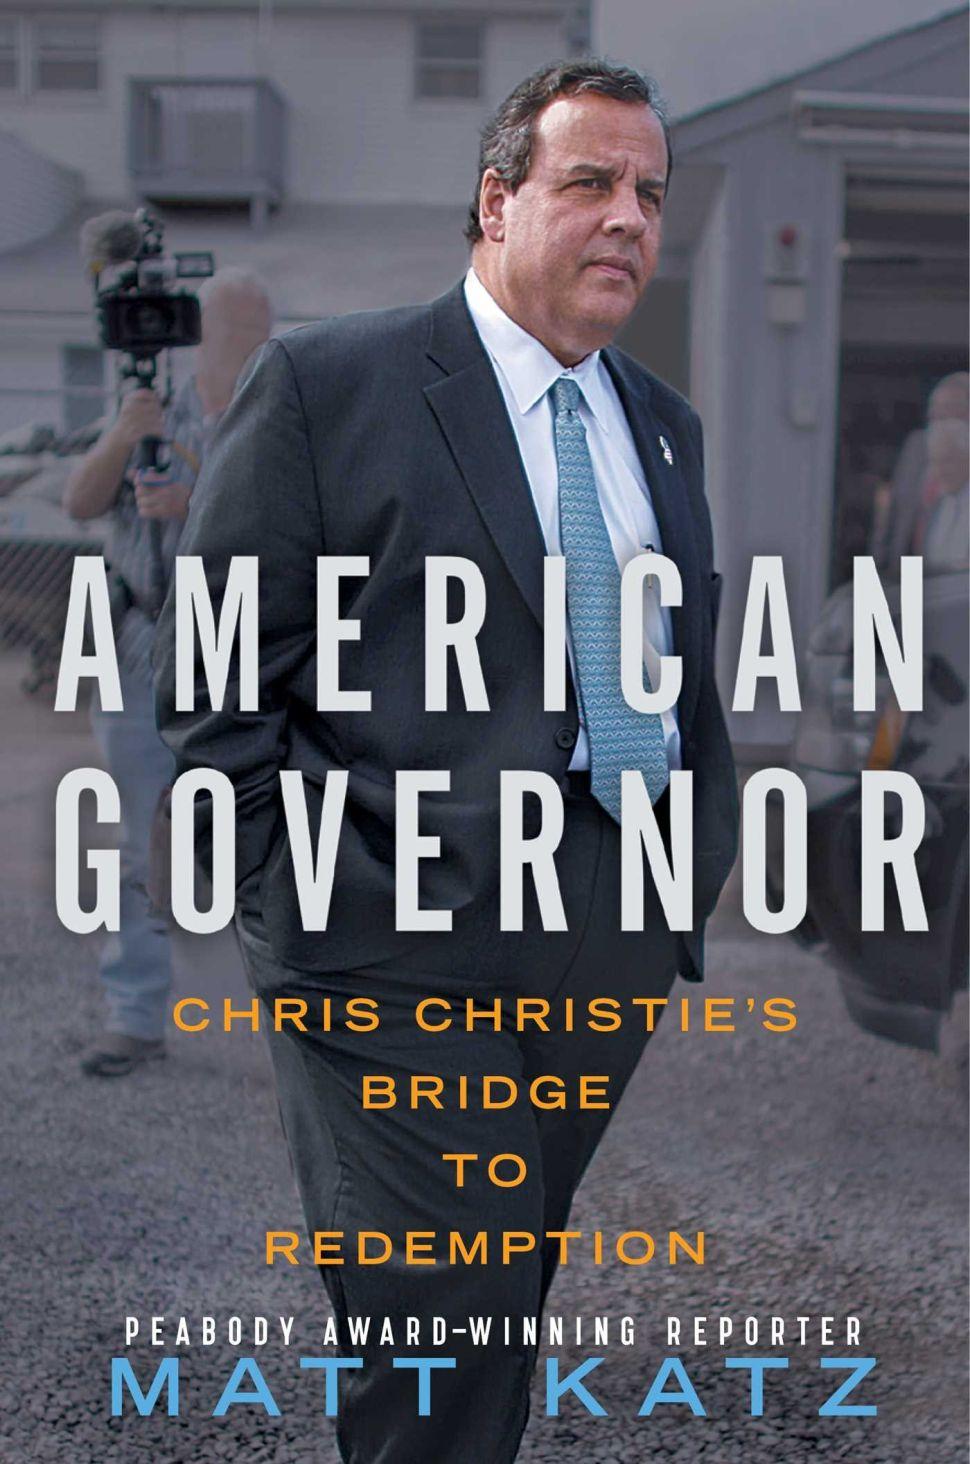 Book Review: Matt Katz's 'American Governor'